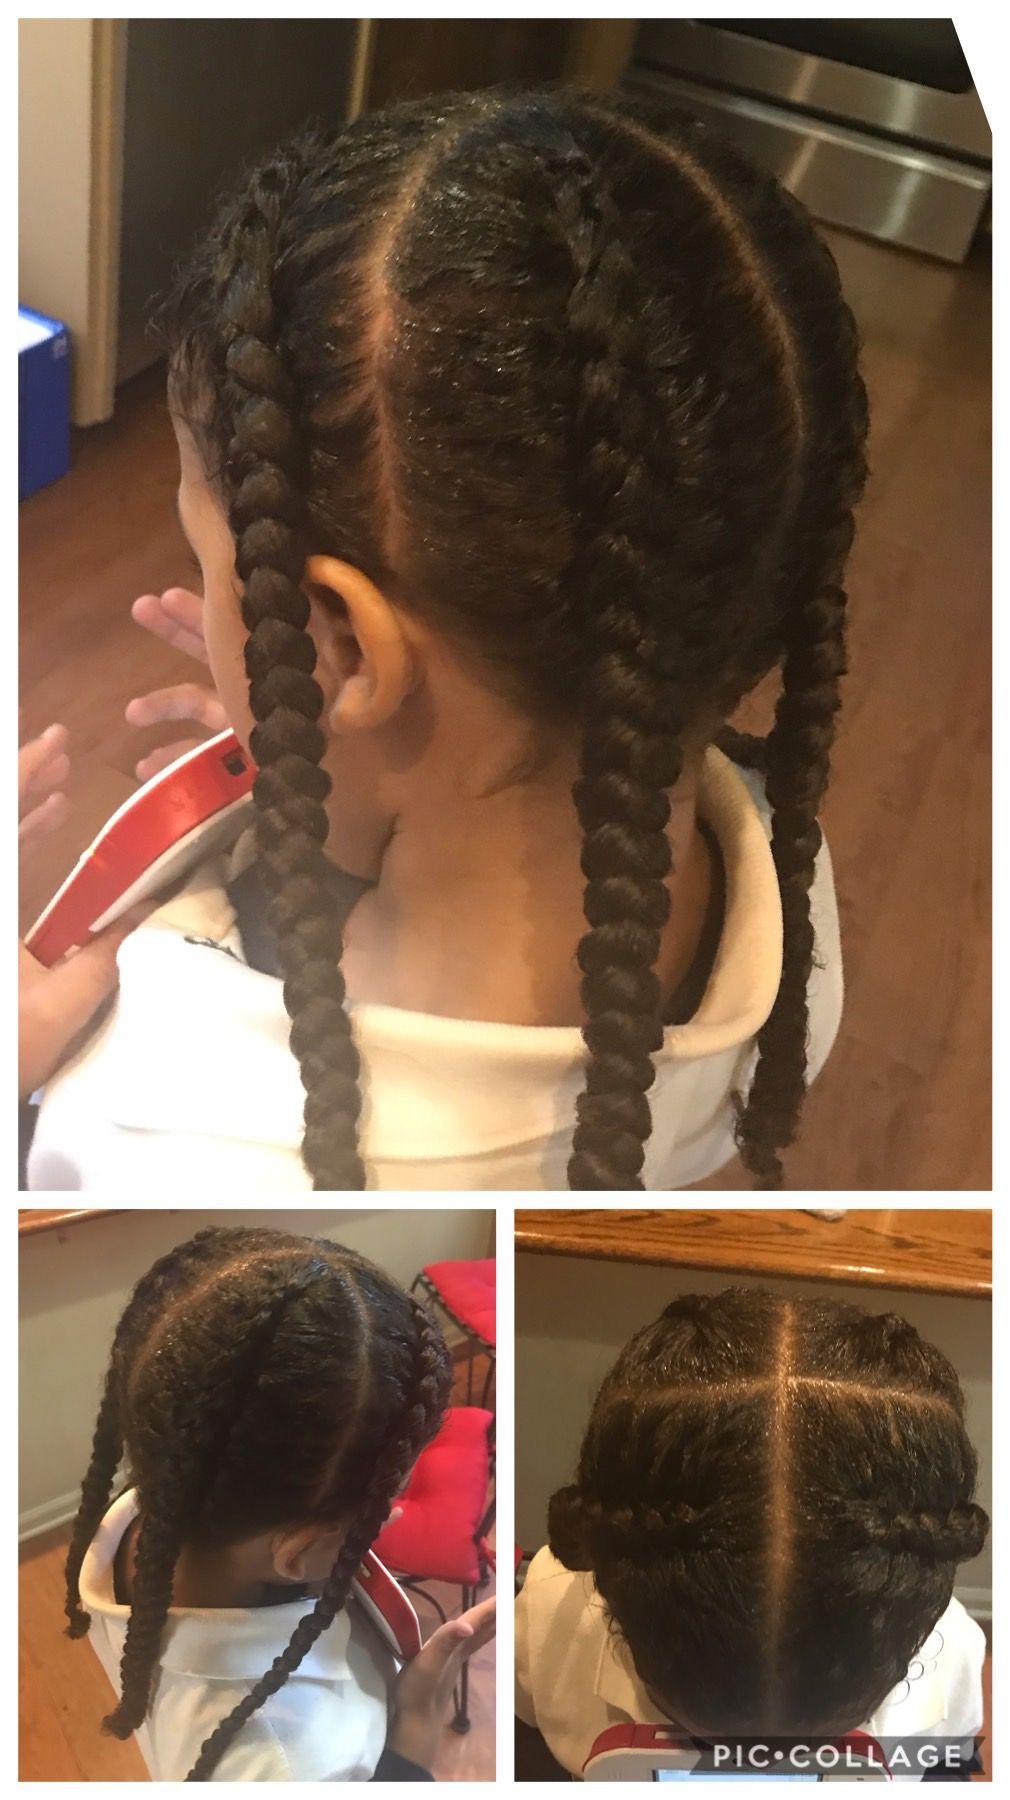 Pin By Strxngbandz On Braided Braids For Boys Boys Long Hairstyles Kids Boy Hairstyles